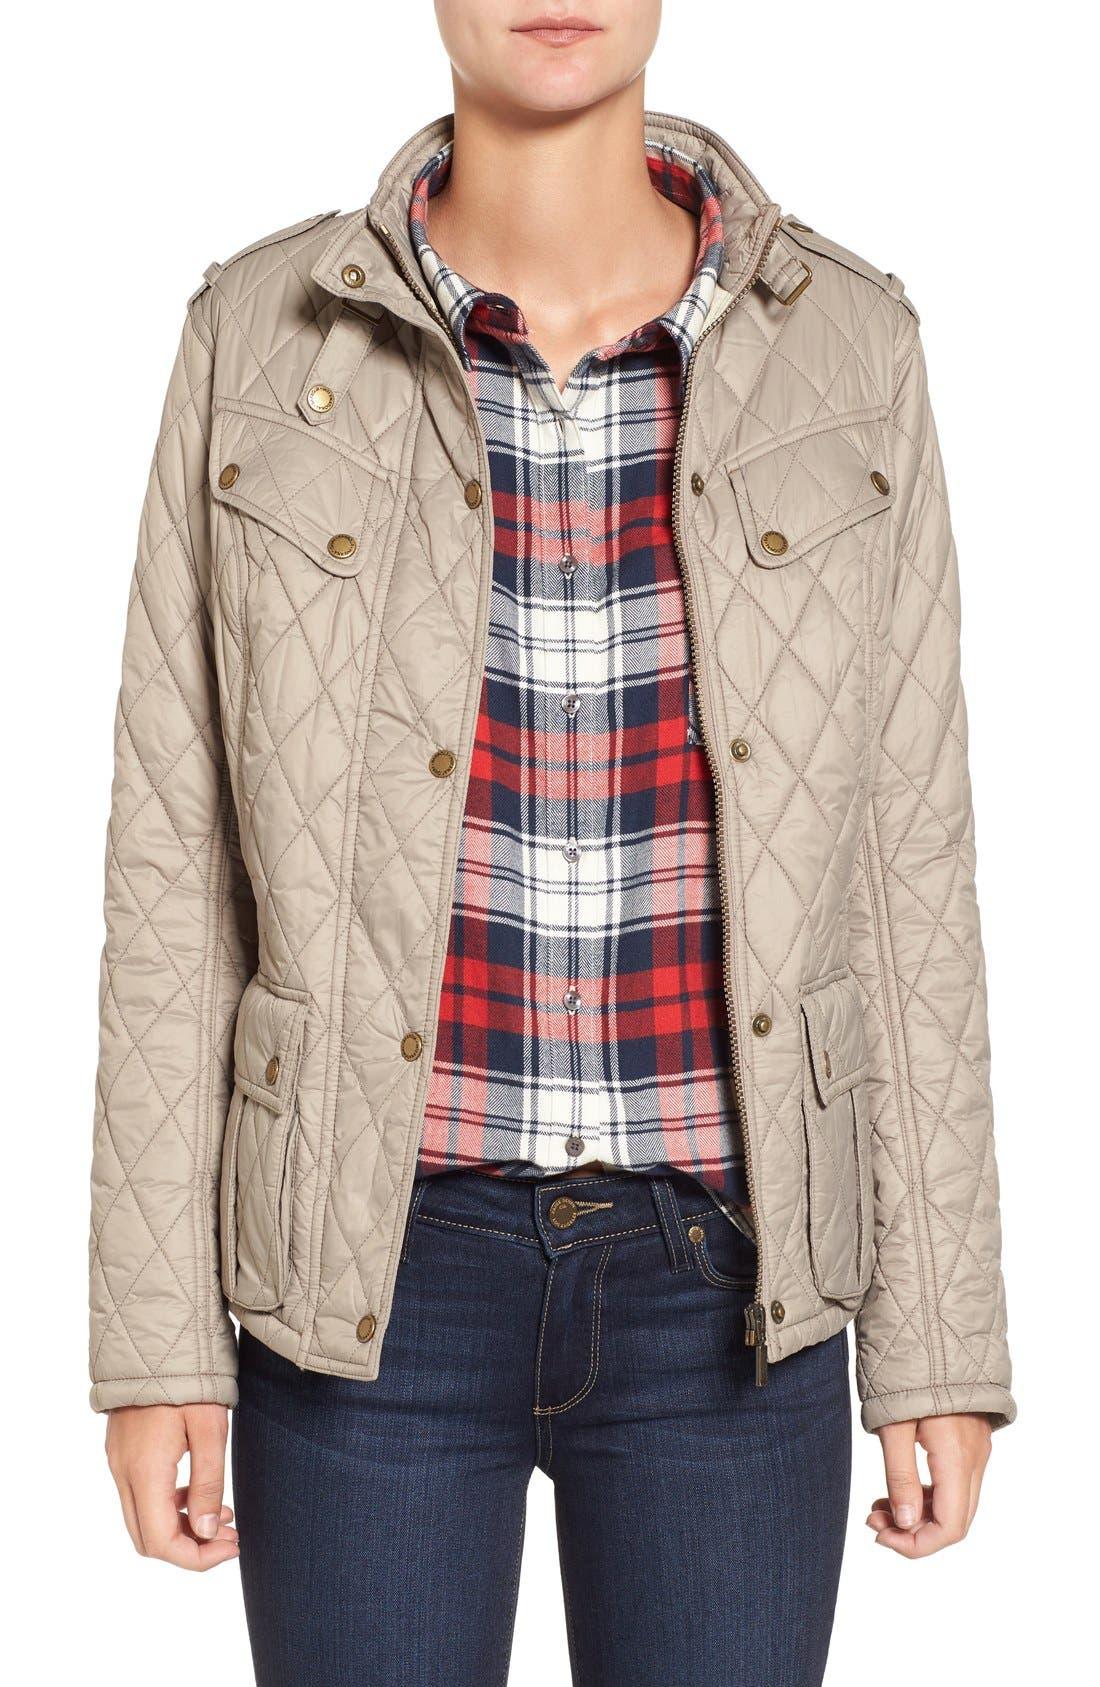 Alternate Image 1 Selected - Barbour International Caster Quilted Jacket